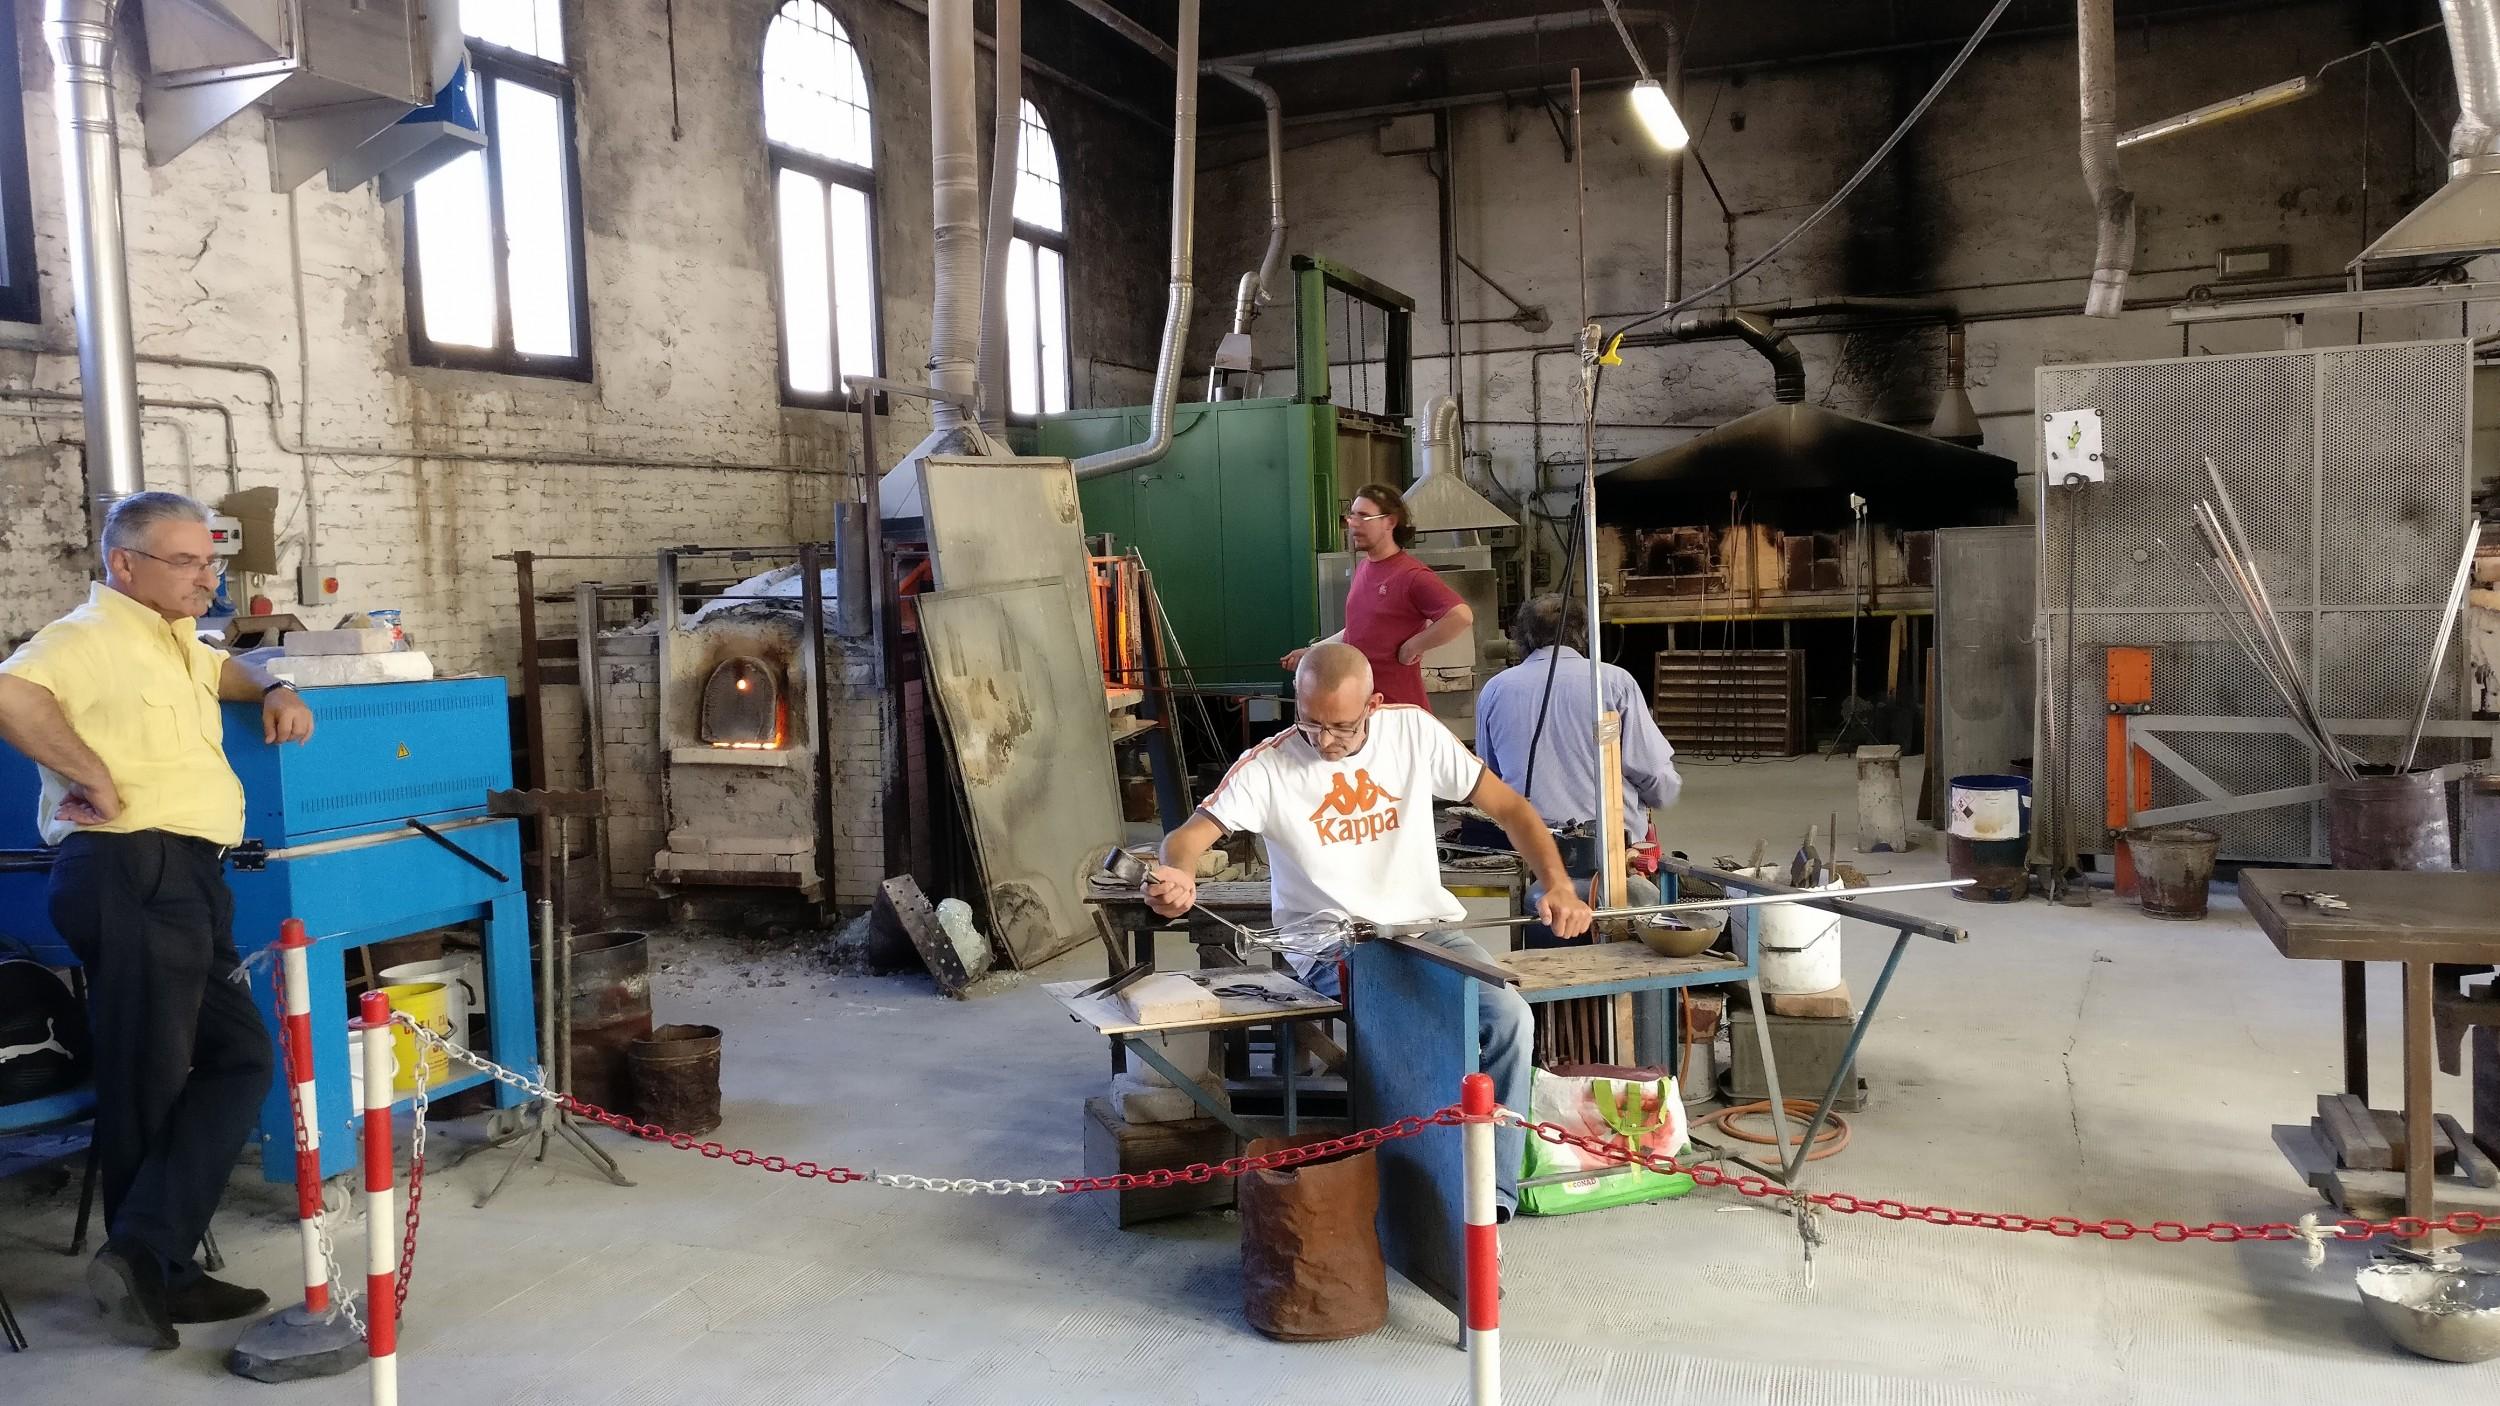 Boattrip-to-Murano-Island-Venice-Italy-49 workshop